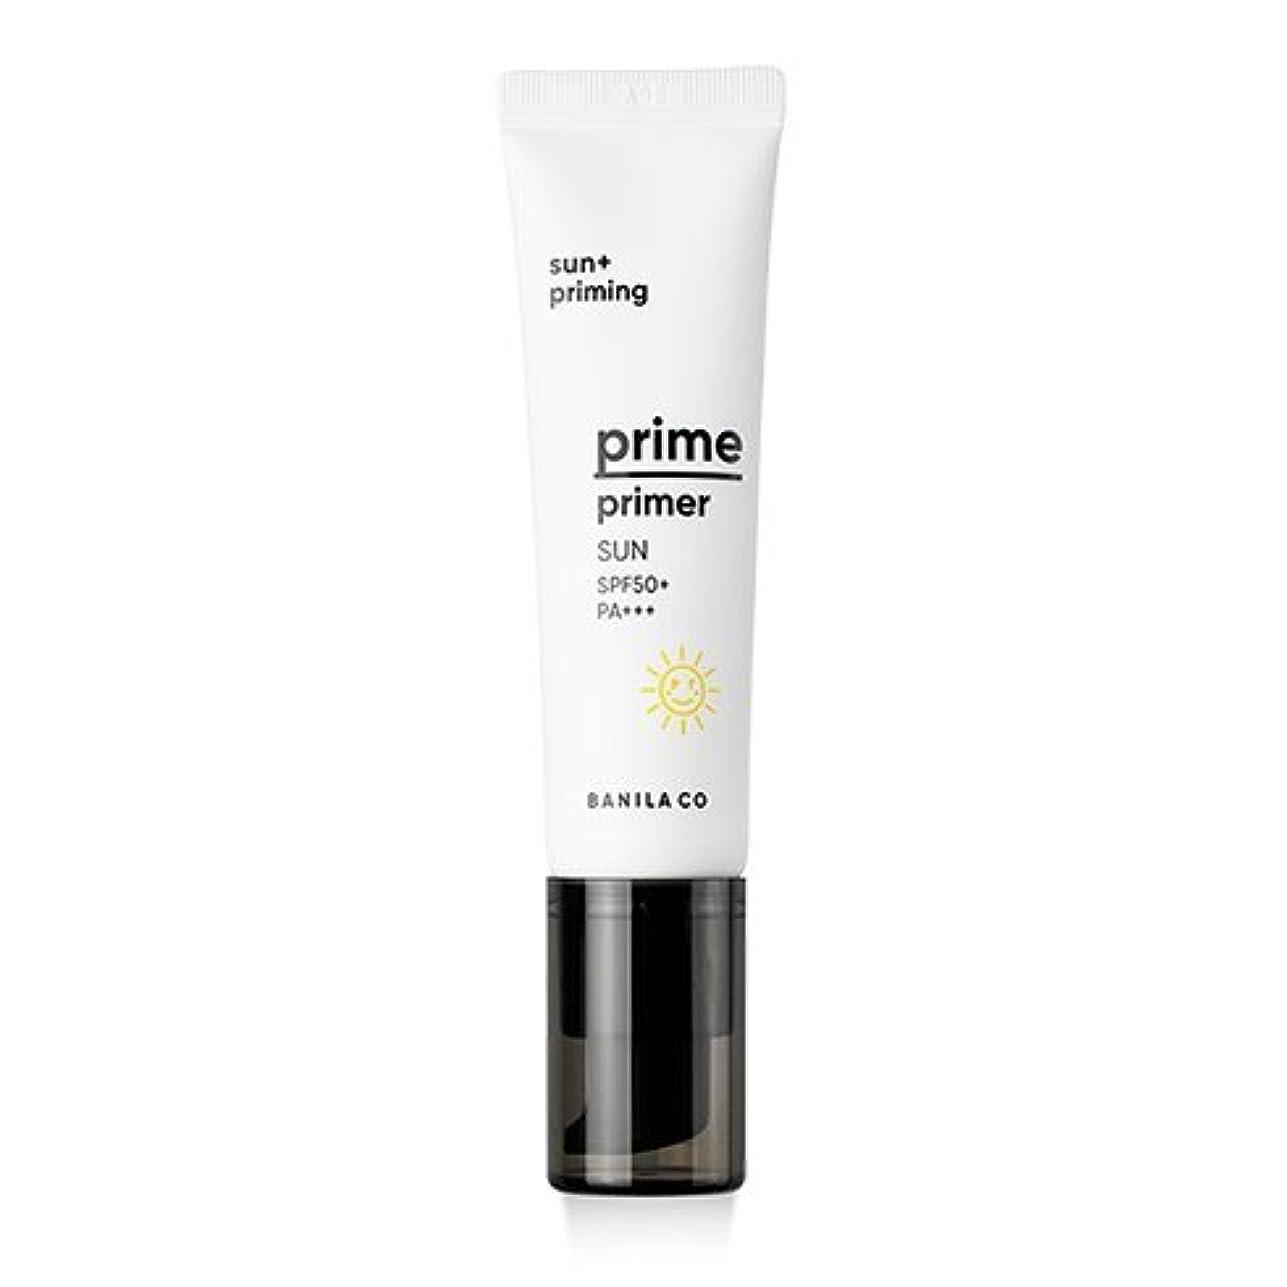 [Renewal] BANILA CO Prime Primer Sun 30ml/バニラコ プライム プライマー サン 30ml [並行輸入品]